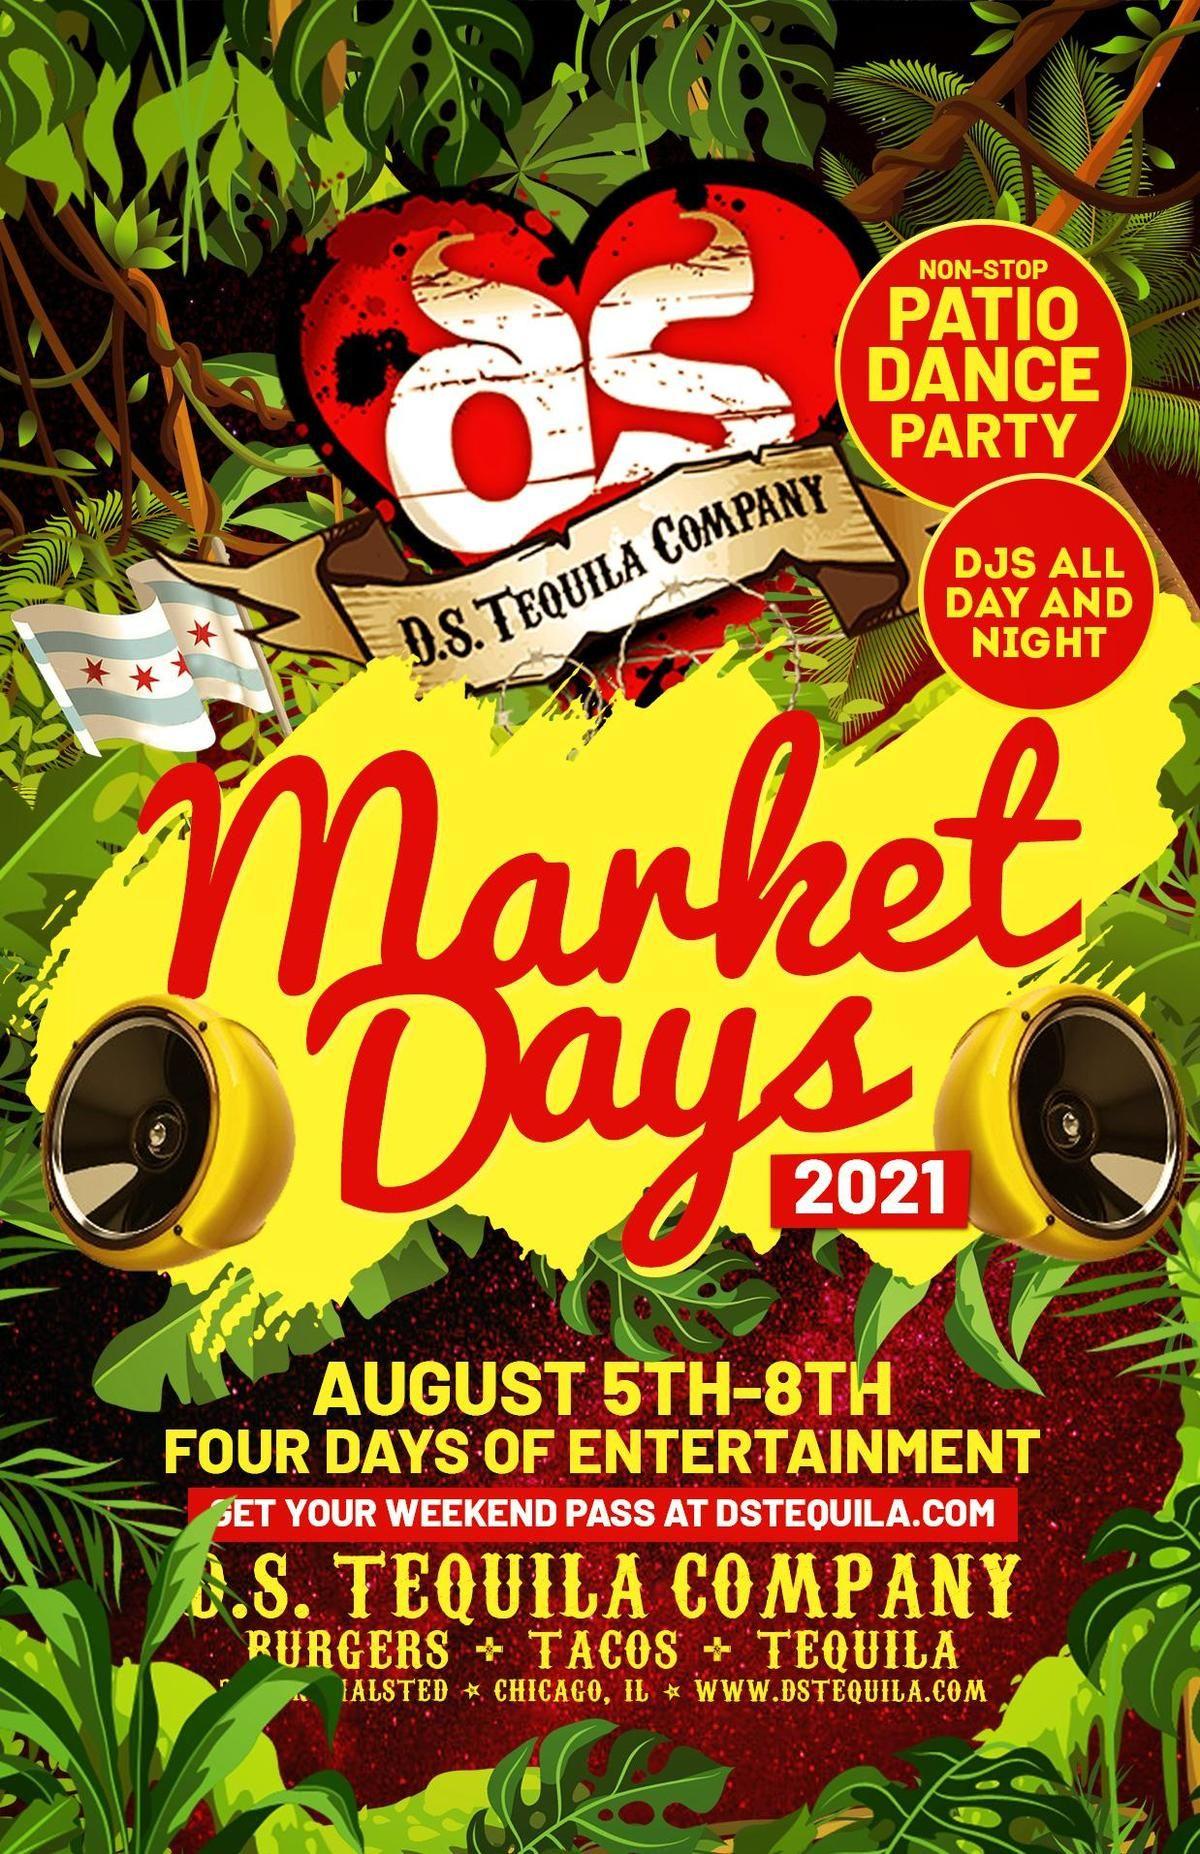 D.S. Tequila Market Days 2021